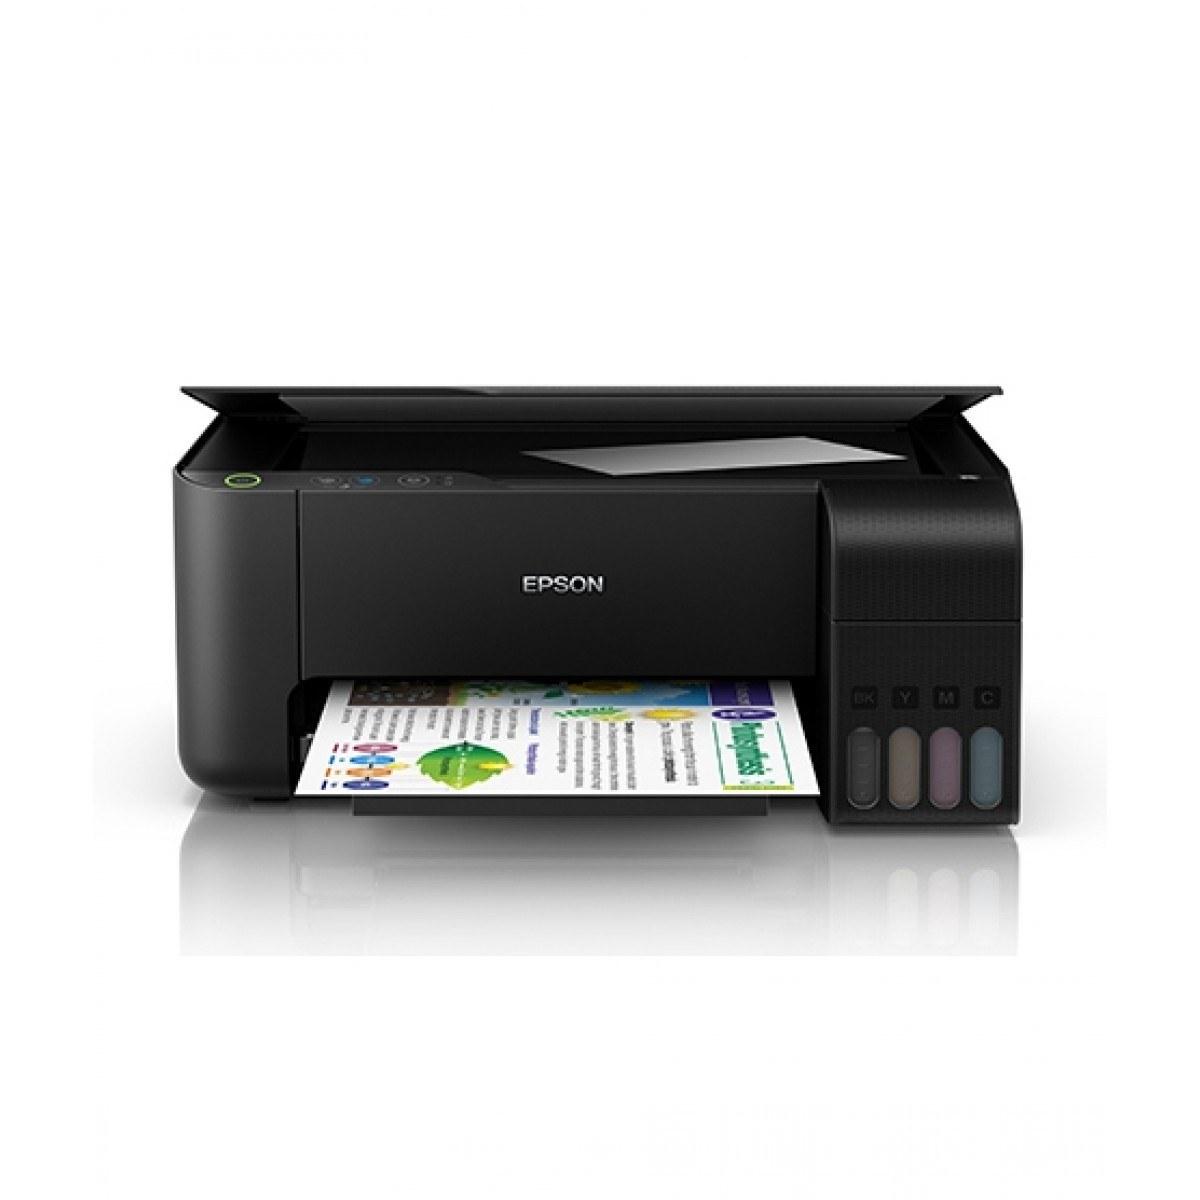 main images پرینتر چندکاره جوهرافشان اپسون مدل L3110|مشکی EPSON L3110 Multifunction Inkjet Printer